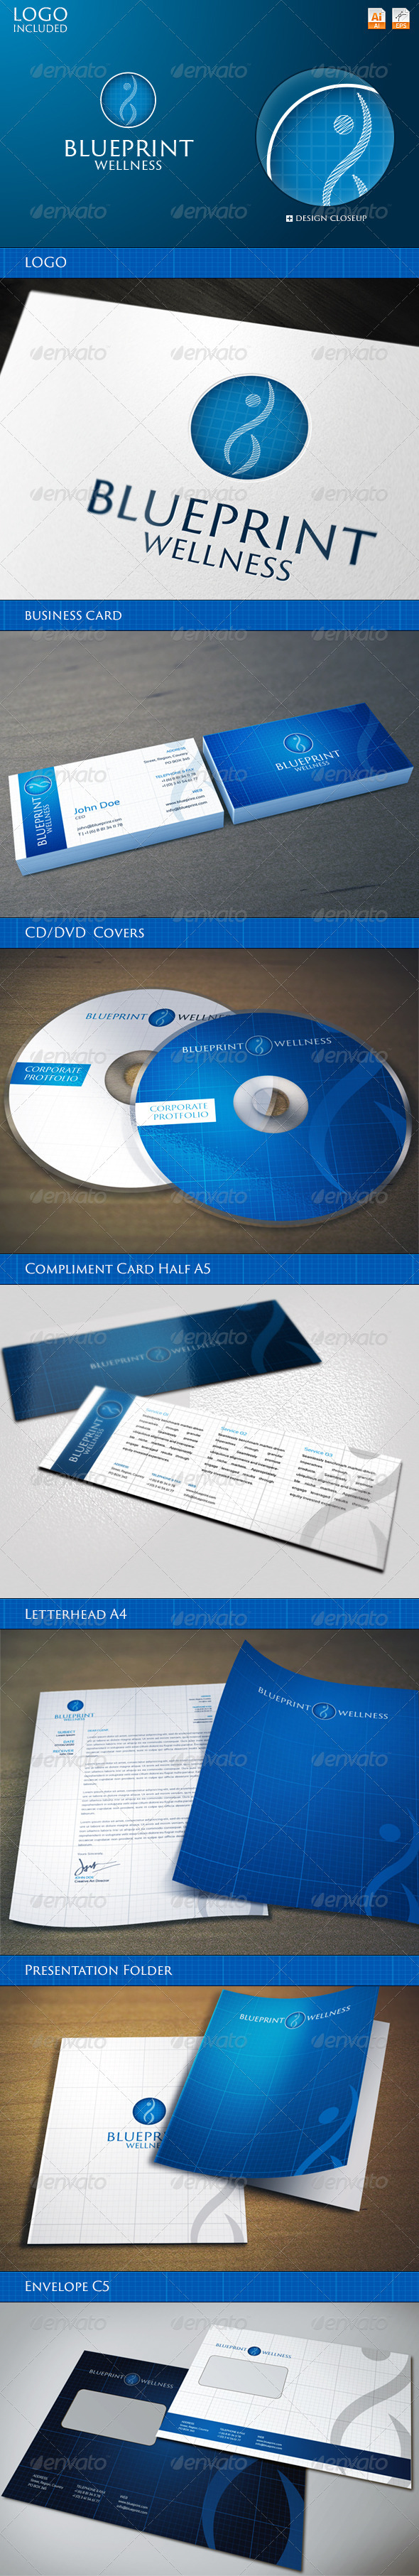 Corporate Identity BluePrint Wellness